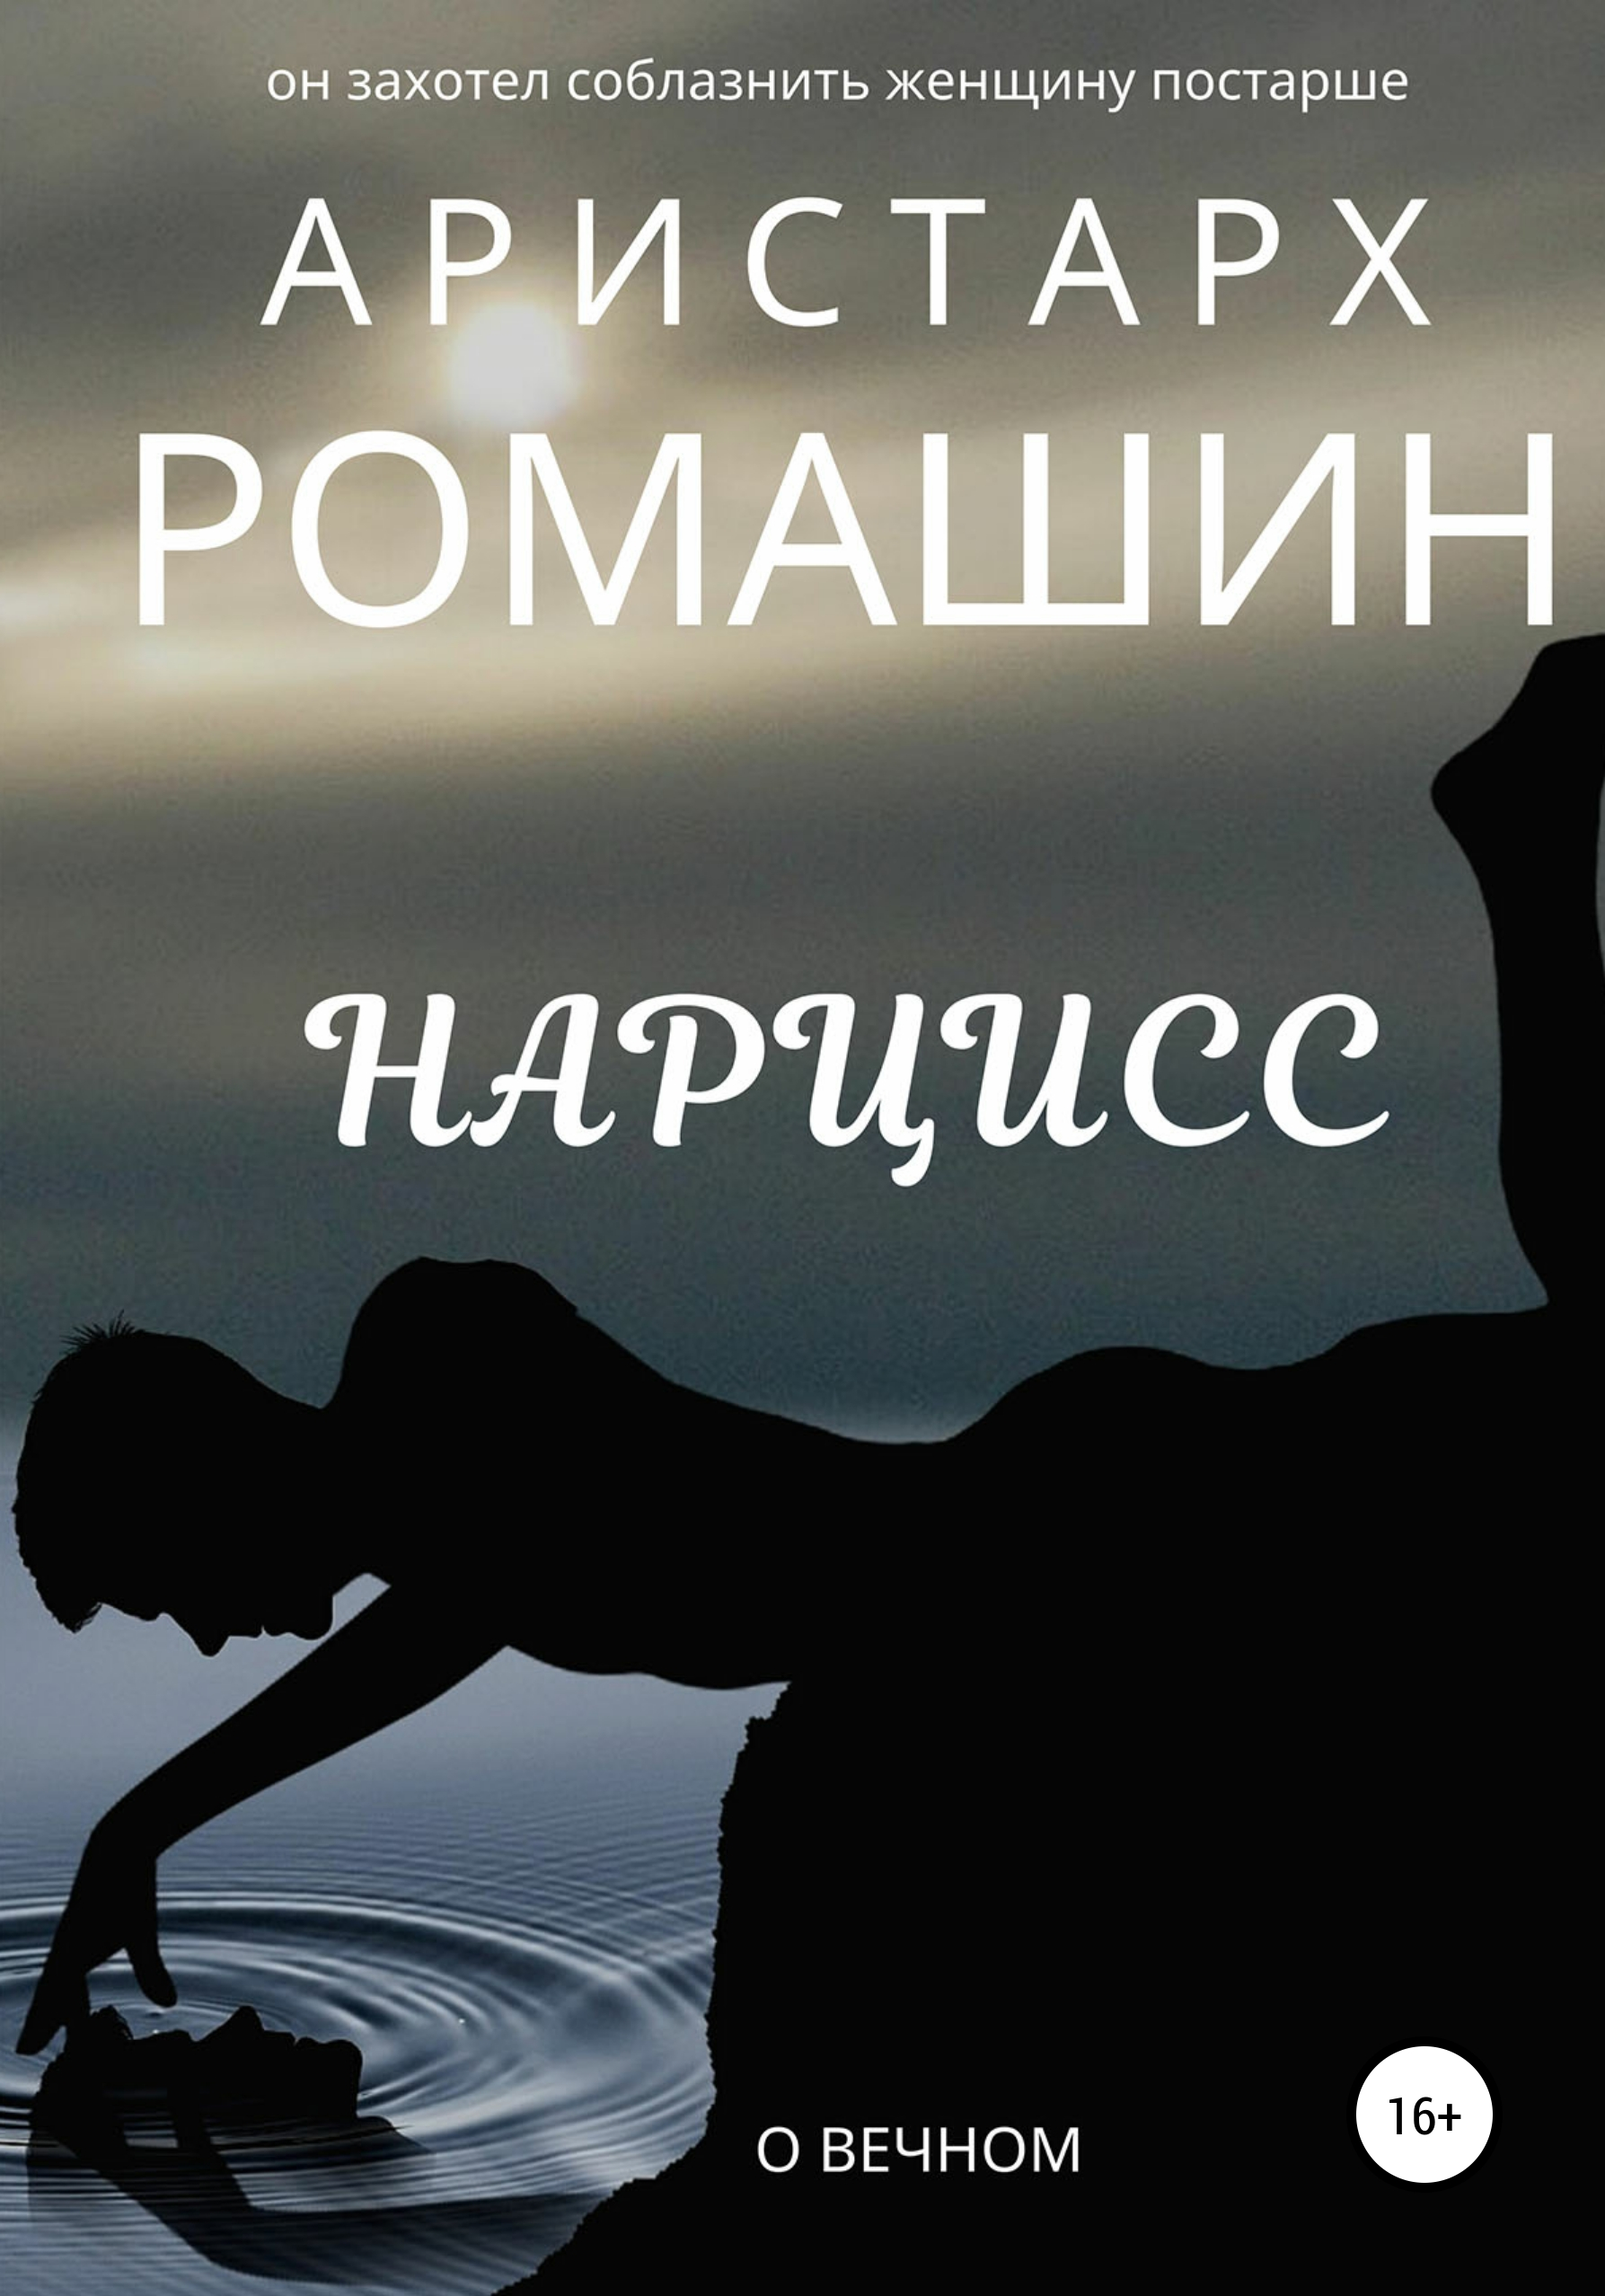 Аристарх Ромашин Нарцисс аристарх ромашин призраки